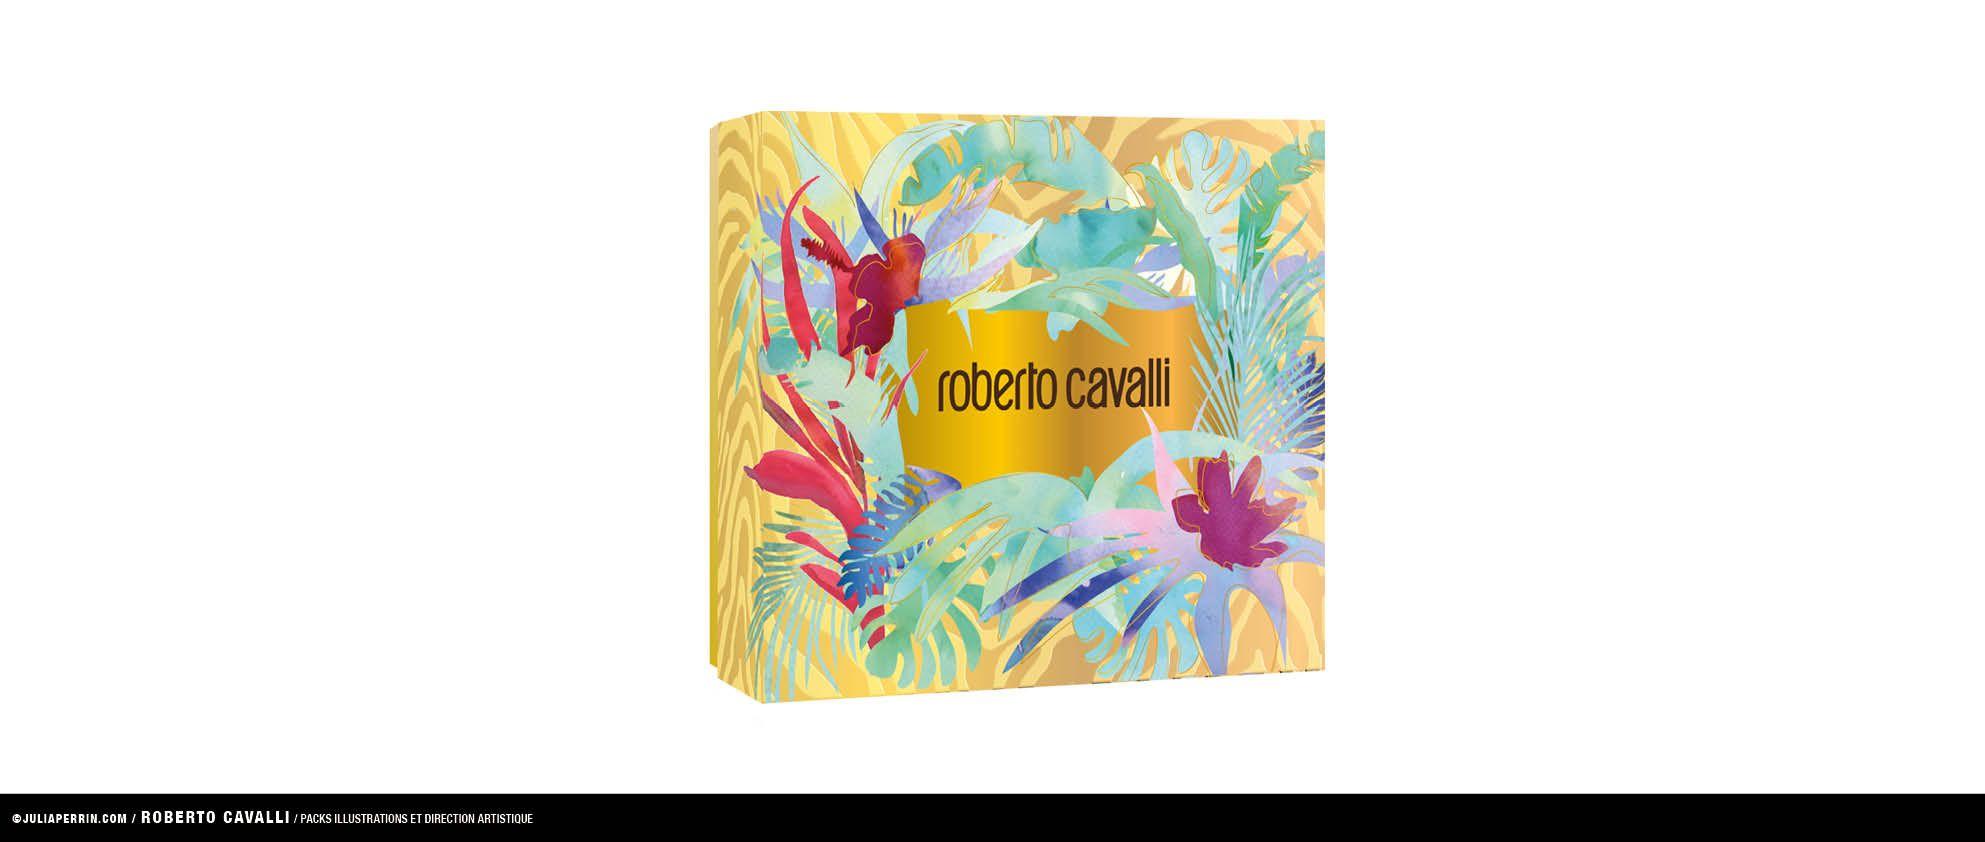 Julia Perrin for Roberto Cavalli : #juliaperrin #illustration #illustrator #robertocavalli #beautyclient #perfume #parfum